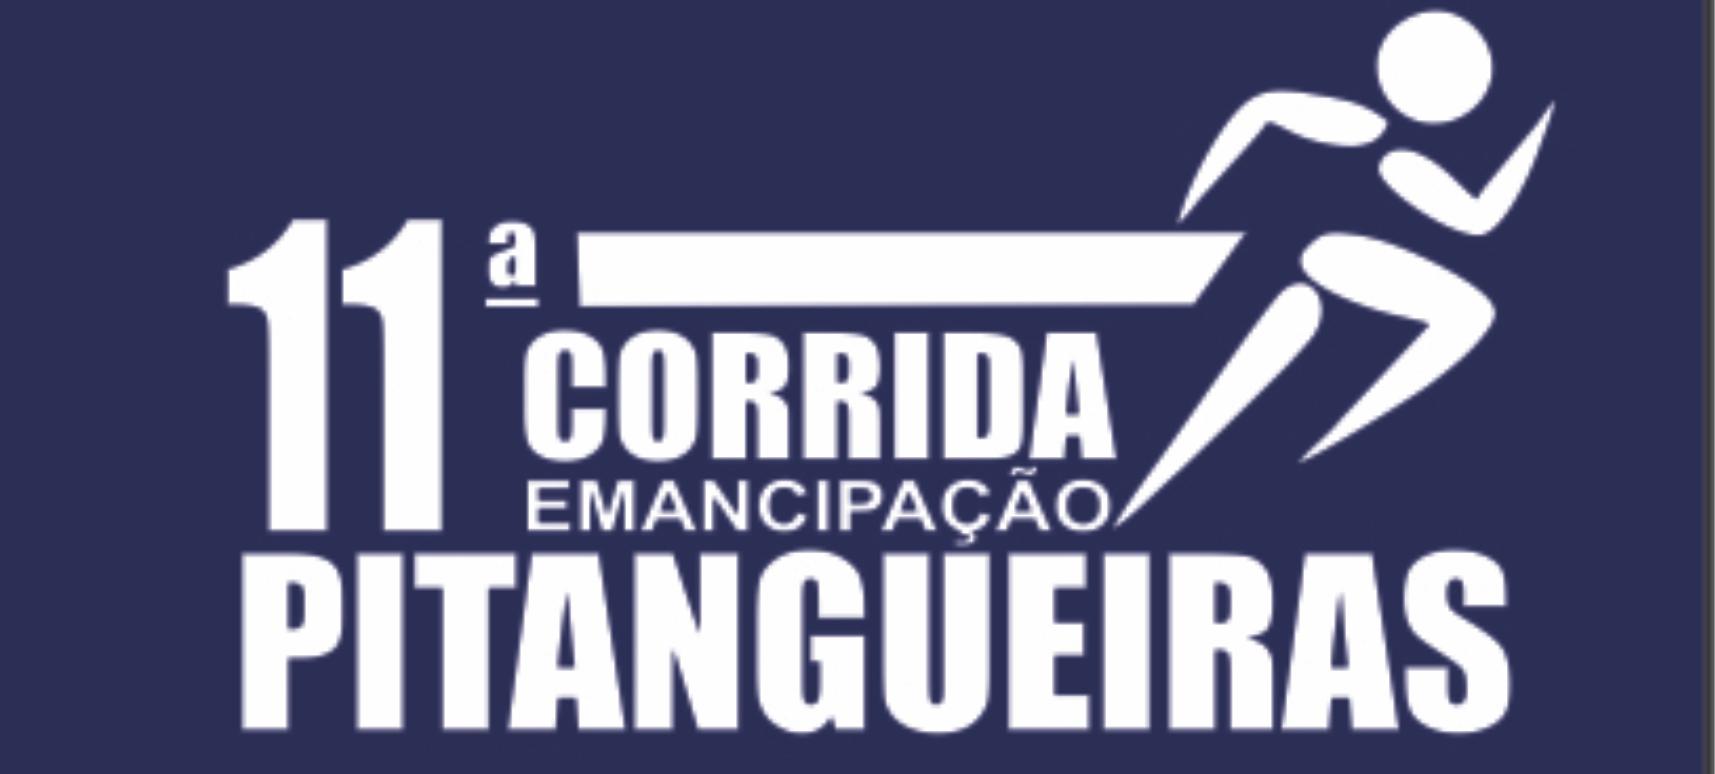 pitangueiras-2019-redes